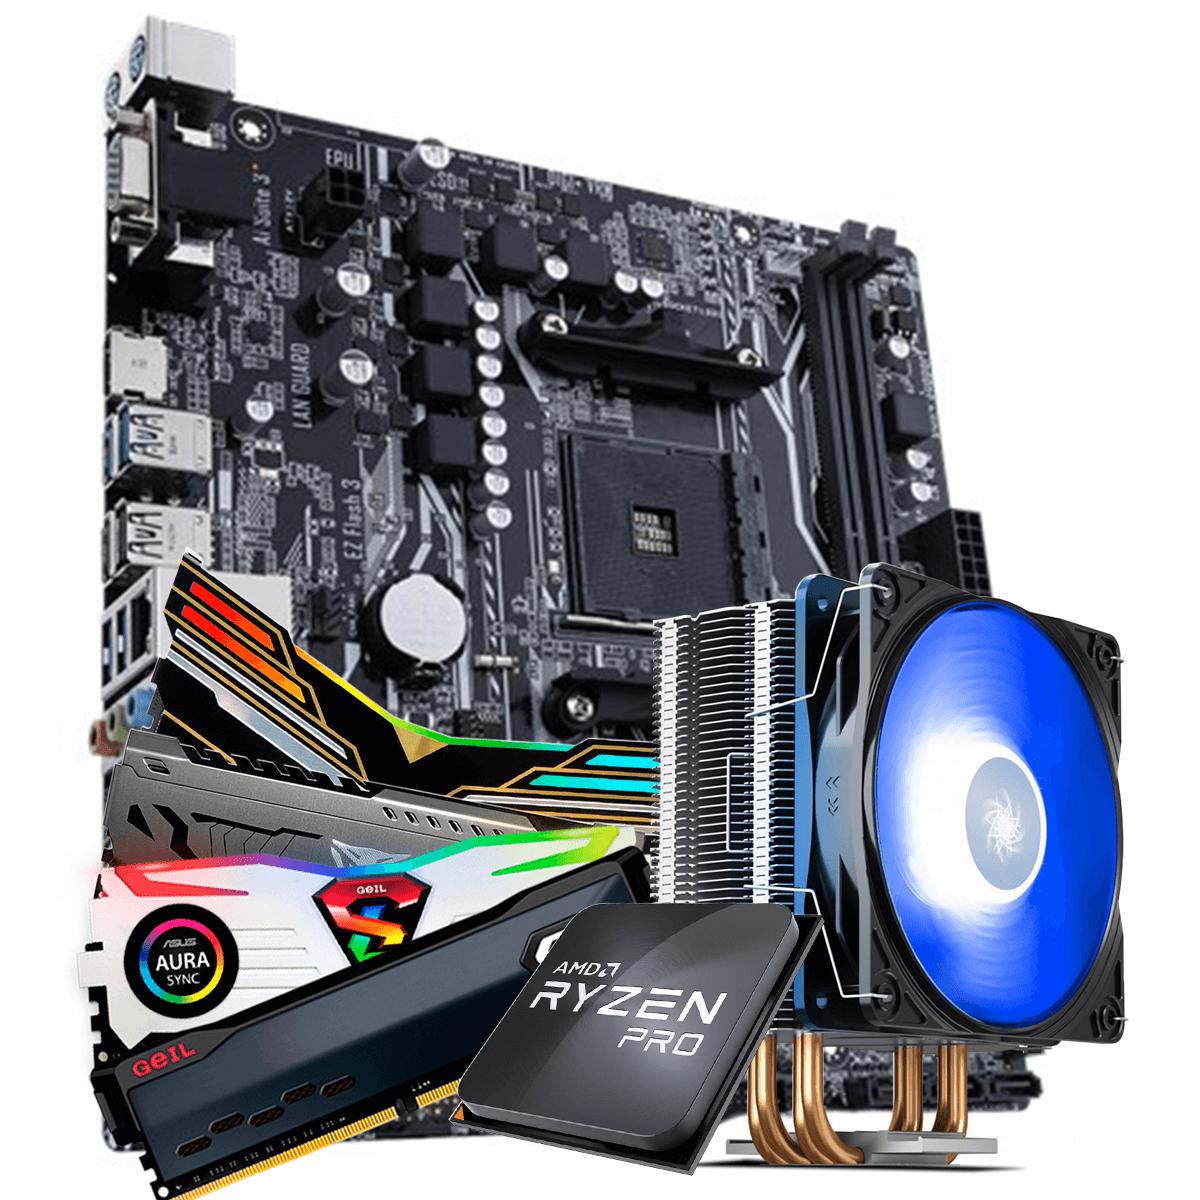 Kit Upgrade, AMD Ryzen 3 PRO 3200GE 3.8GHz Turbo + Cooler, + Asus Prime A320M-K, + Memória DDR4 16GB (2x8GB) 3000MHz